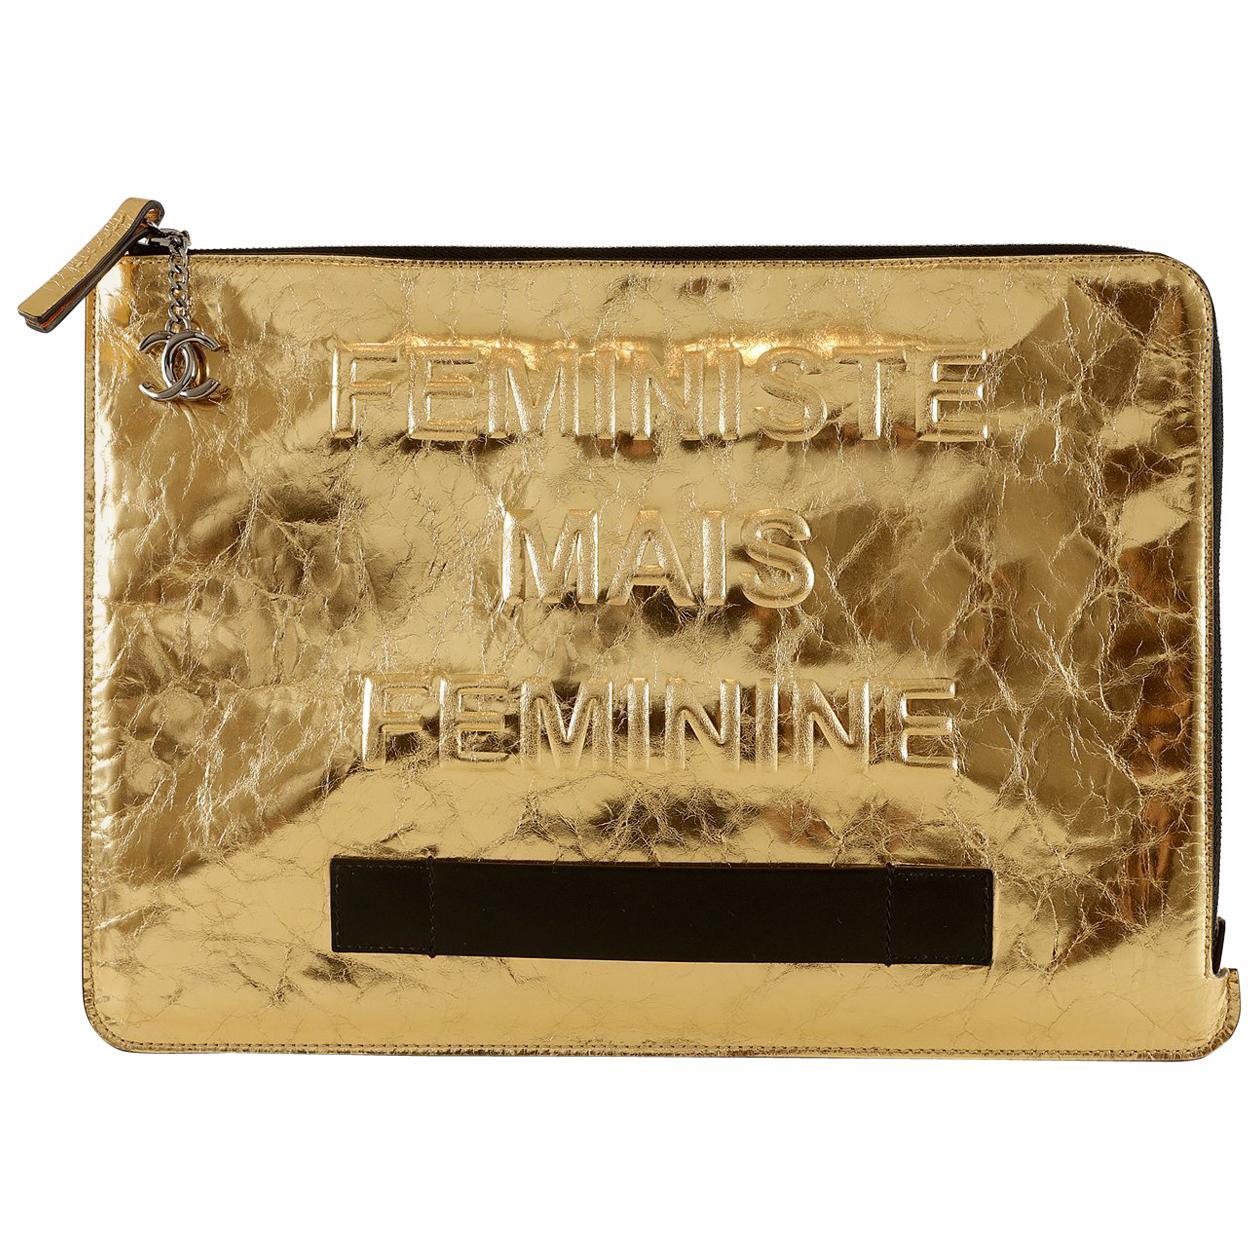 Chanel Gold Metallic Leather Feministe Small Folio Clutch